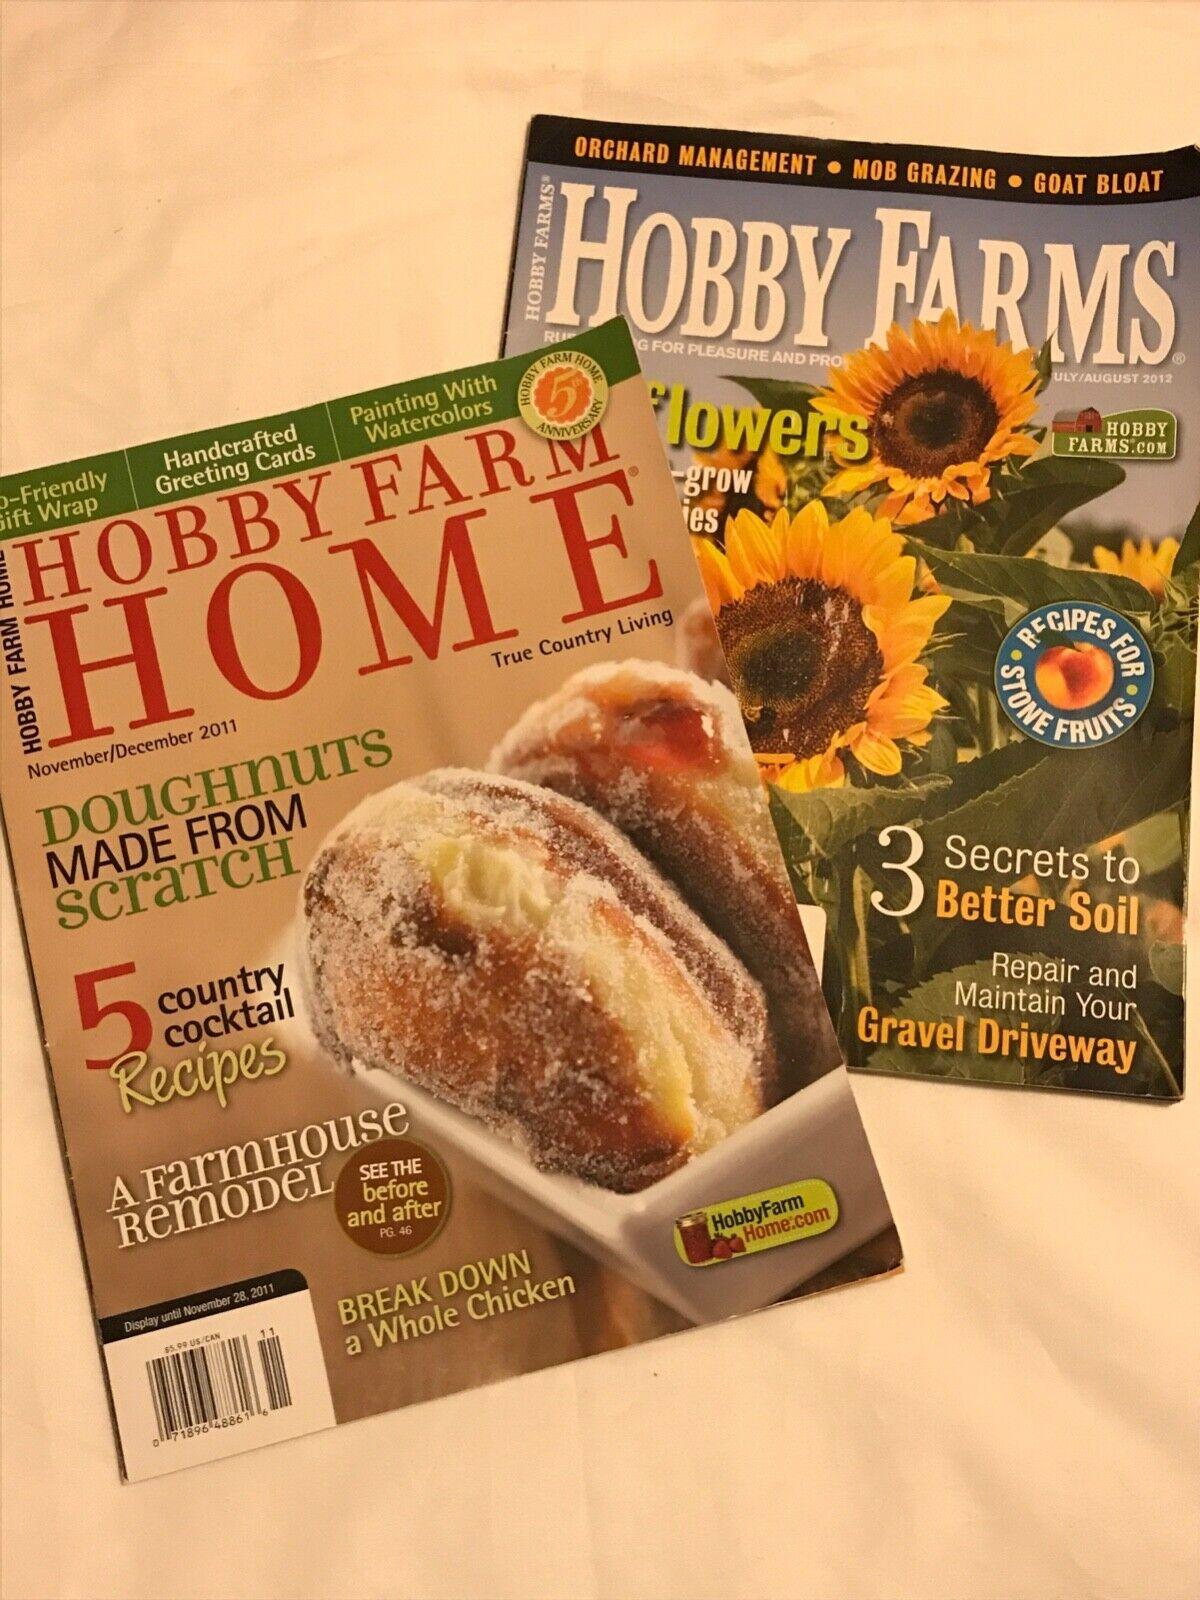 Hobby Farm Magazines Lot Of 2 Good Condition  - $2.50